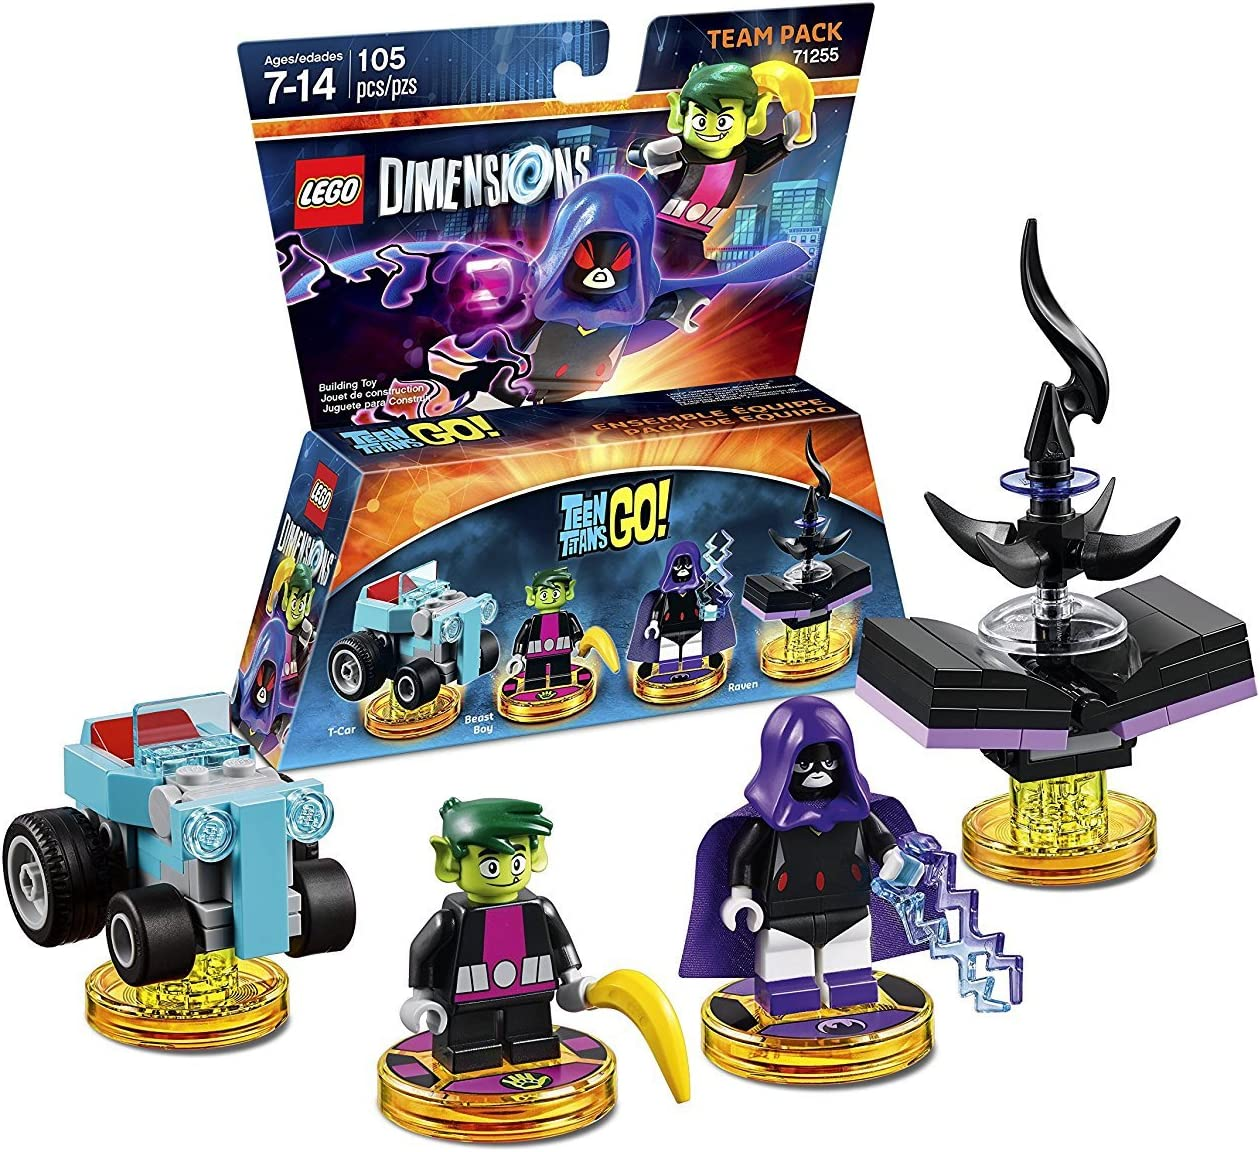 Warner - Teen Titans GO! [Team Pack]: Amazon.es: Videojuegos